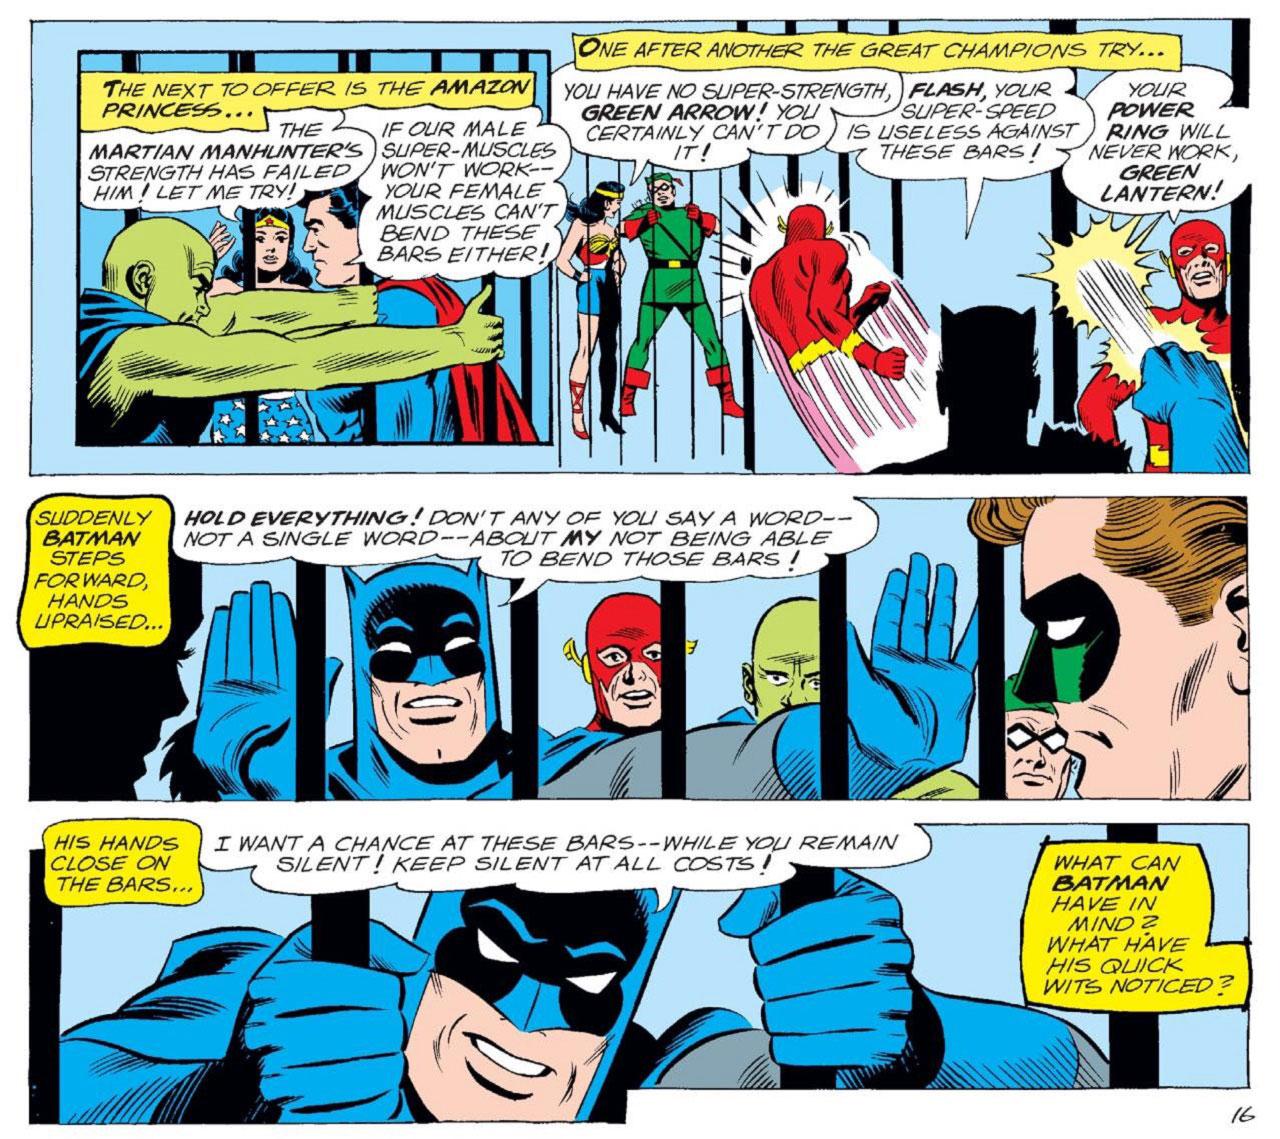 Batman-League-1.jpg